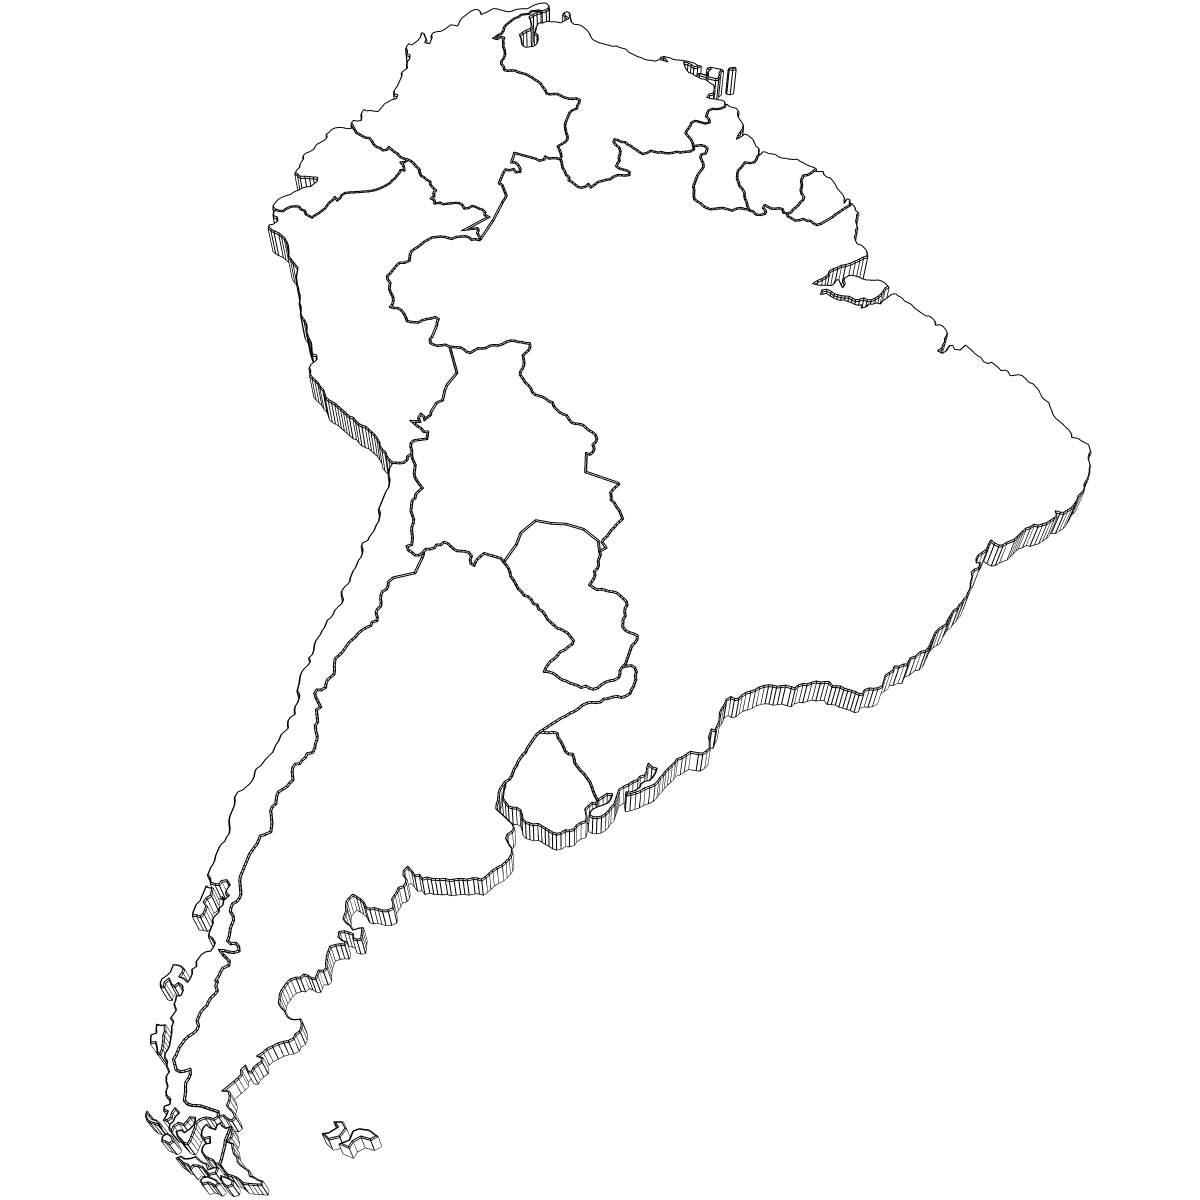 South America Drawing At Getdrawings